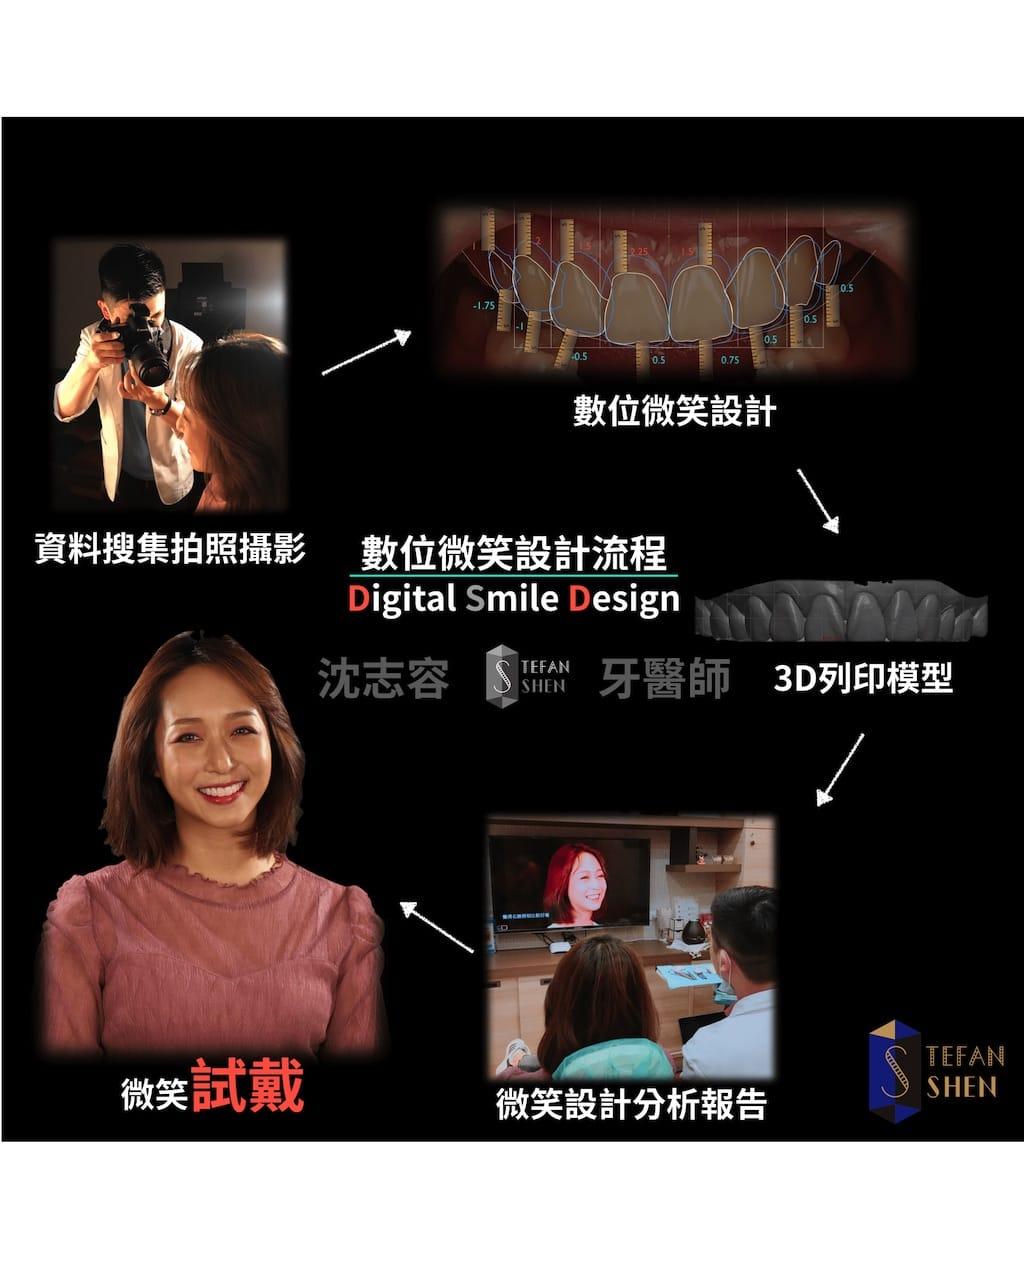 DSD數位微笑設計流程